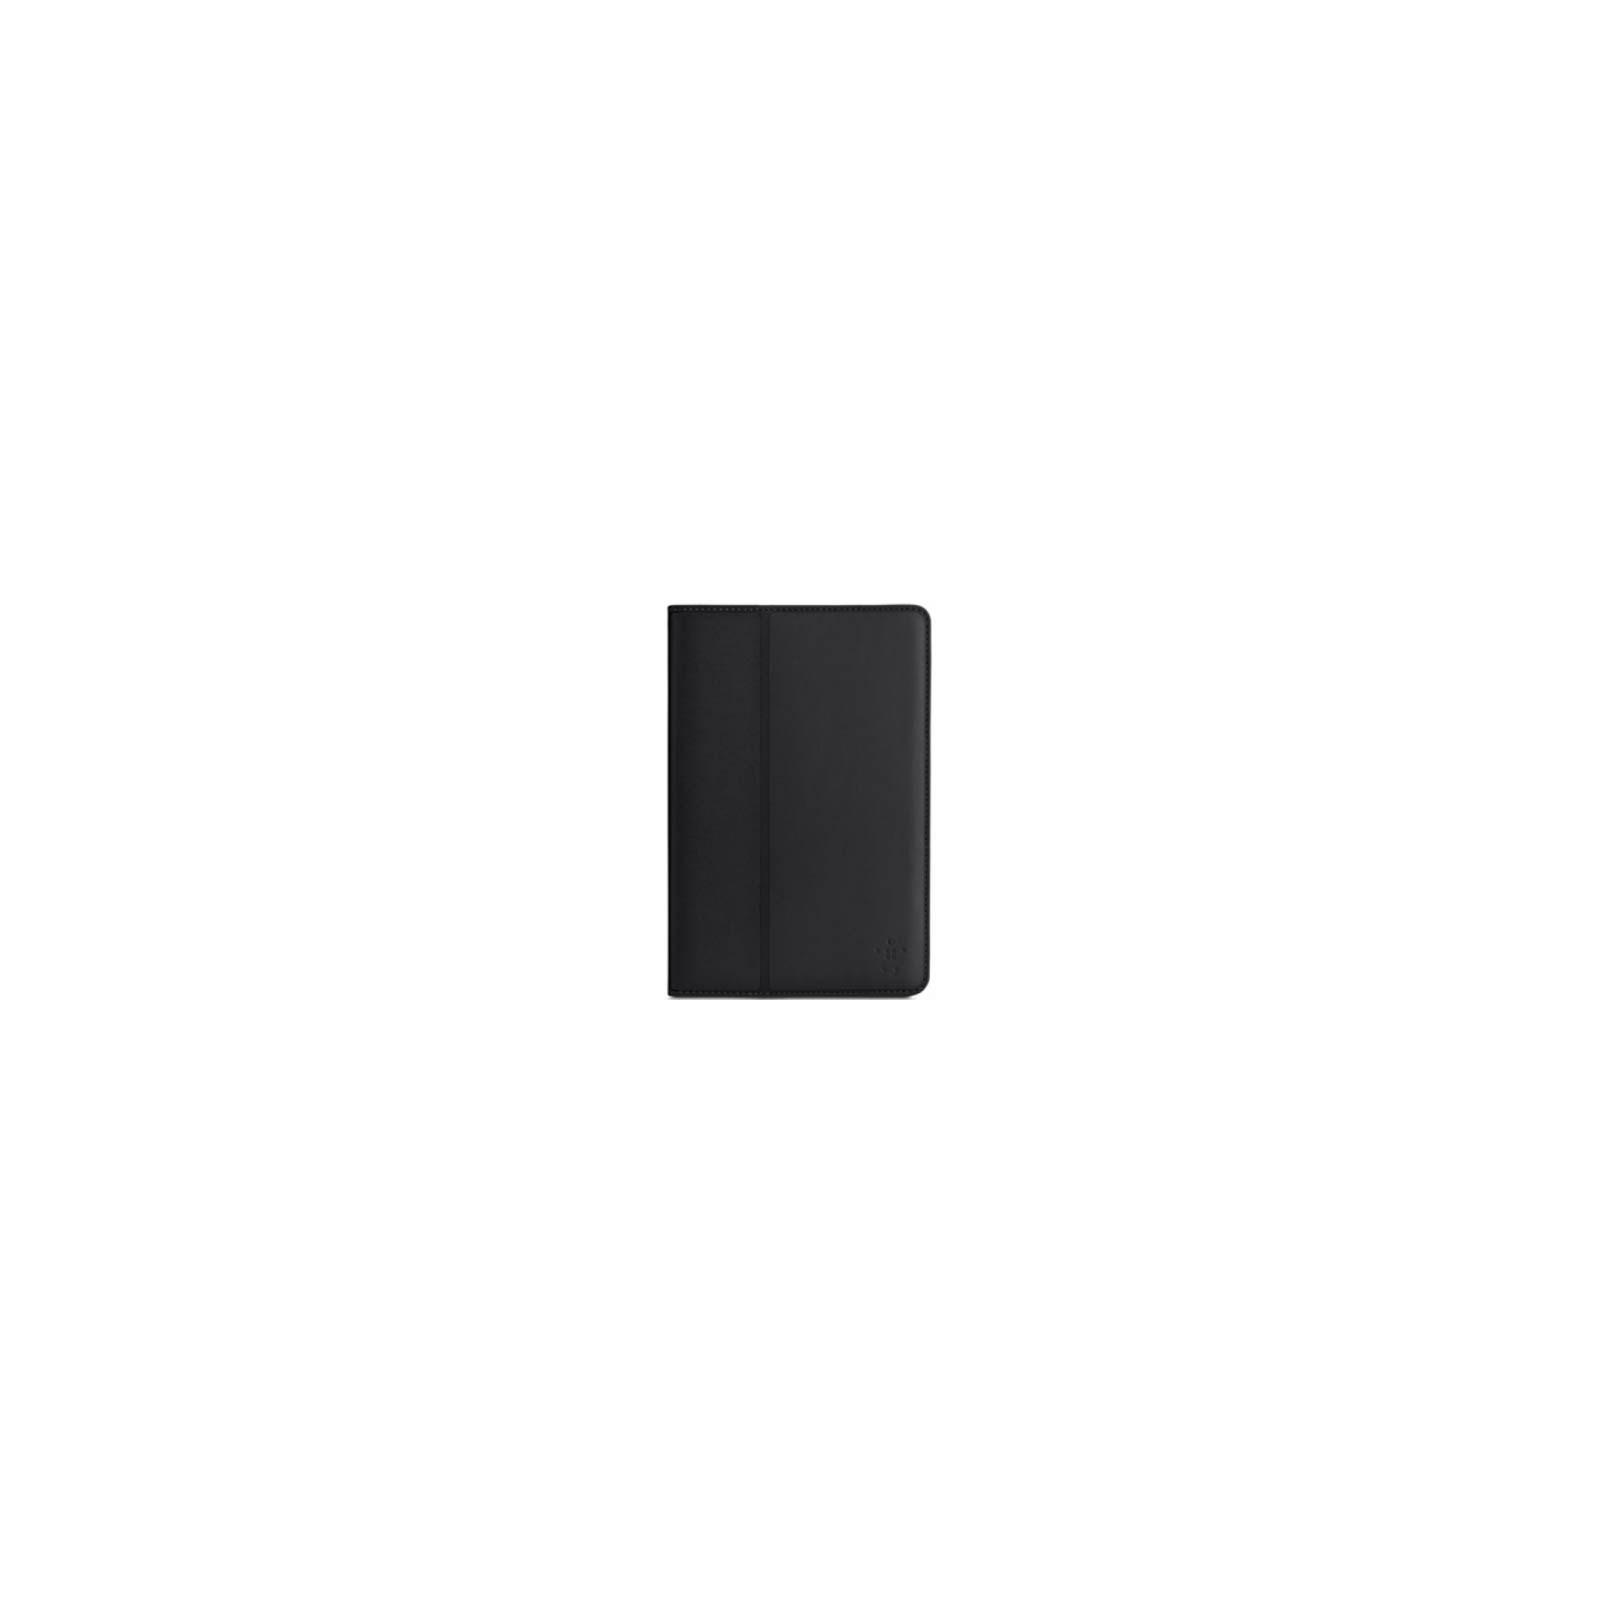 Чехол для планшета Belkin 7 GalaxyTab3 FormFit Stand (F7P114vfC00)